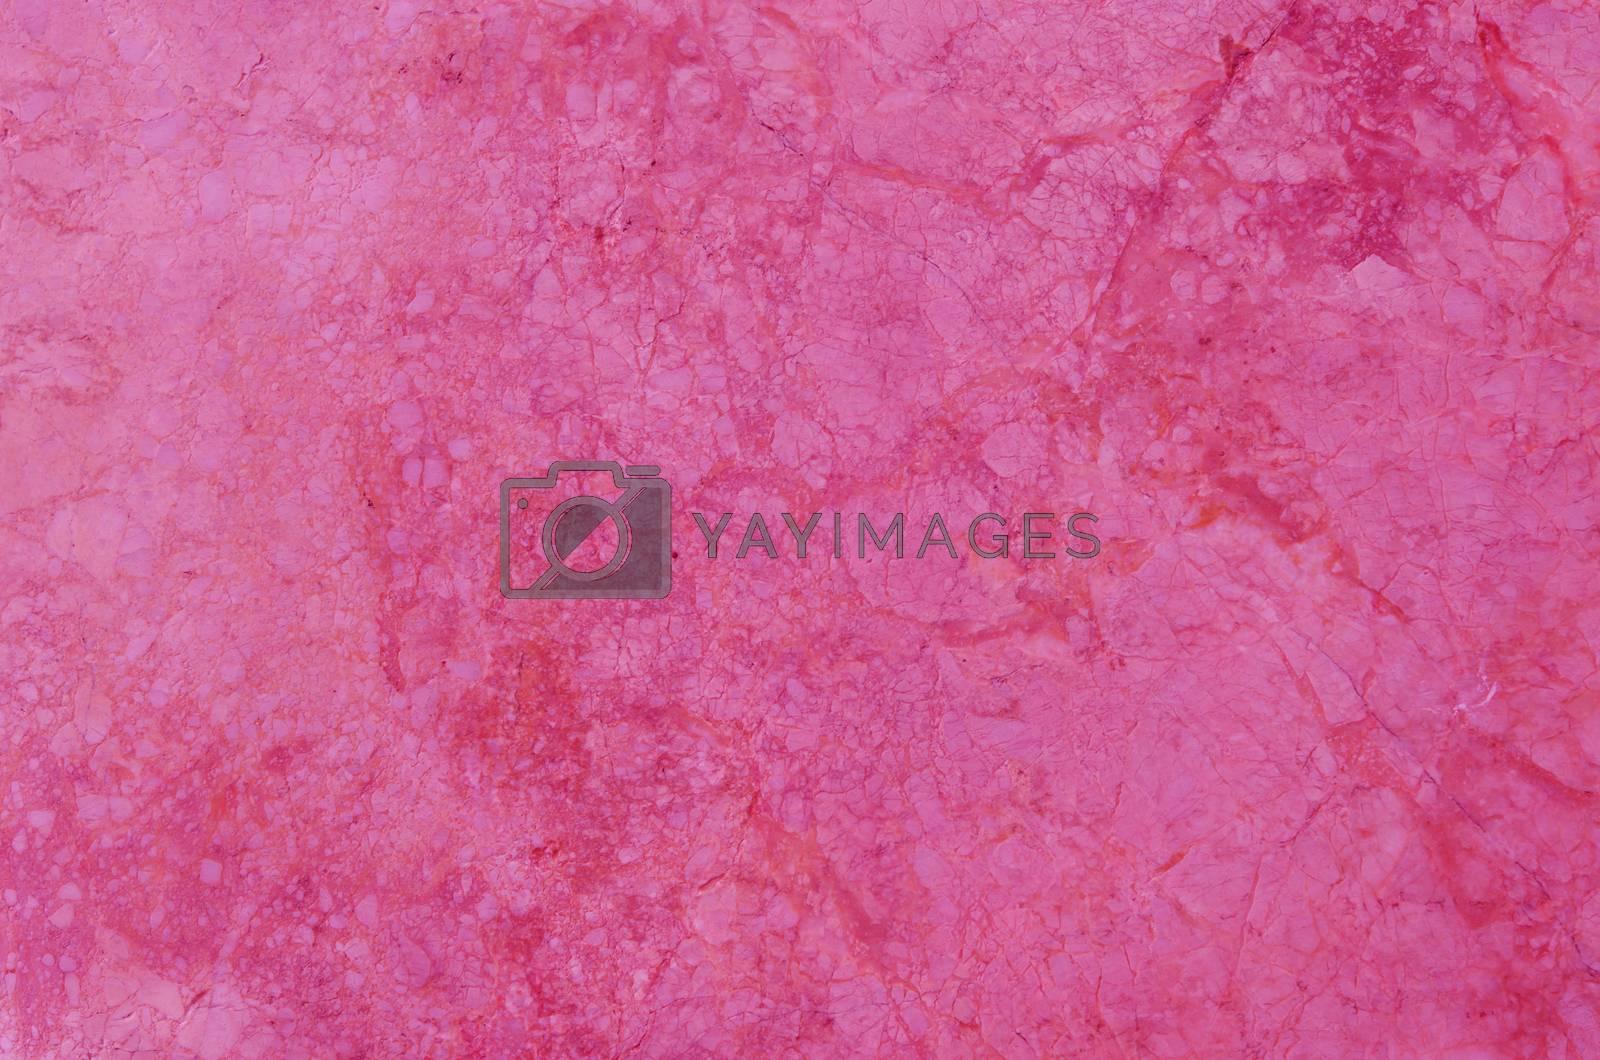 Royalty free image of marble background by rakratchada